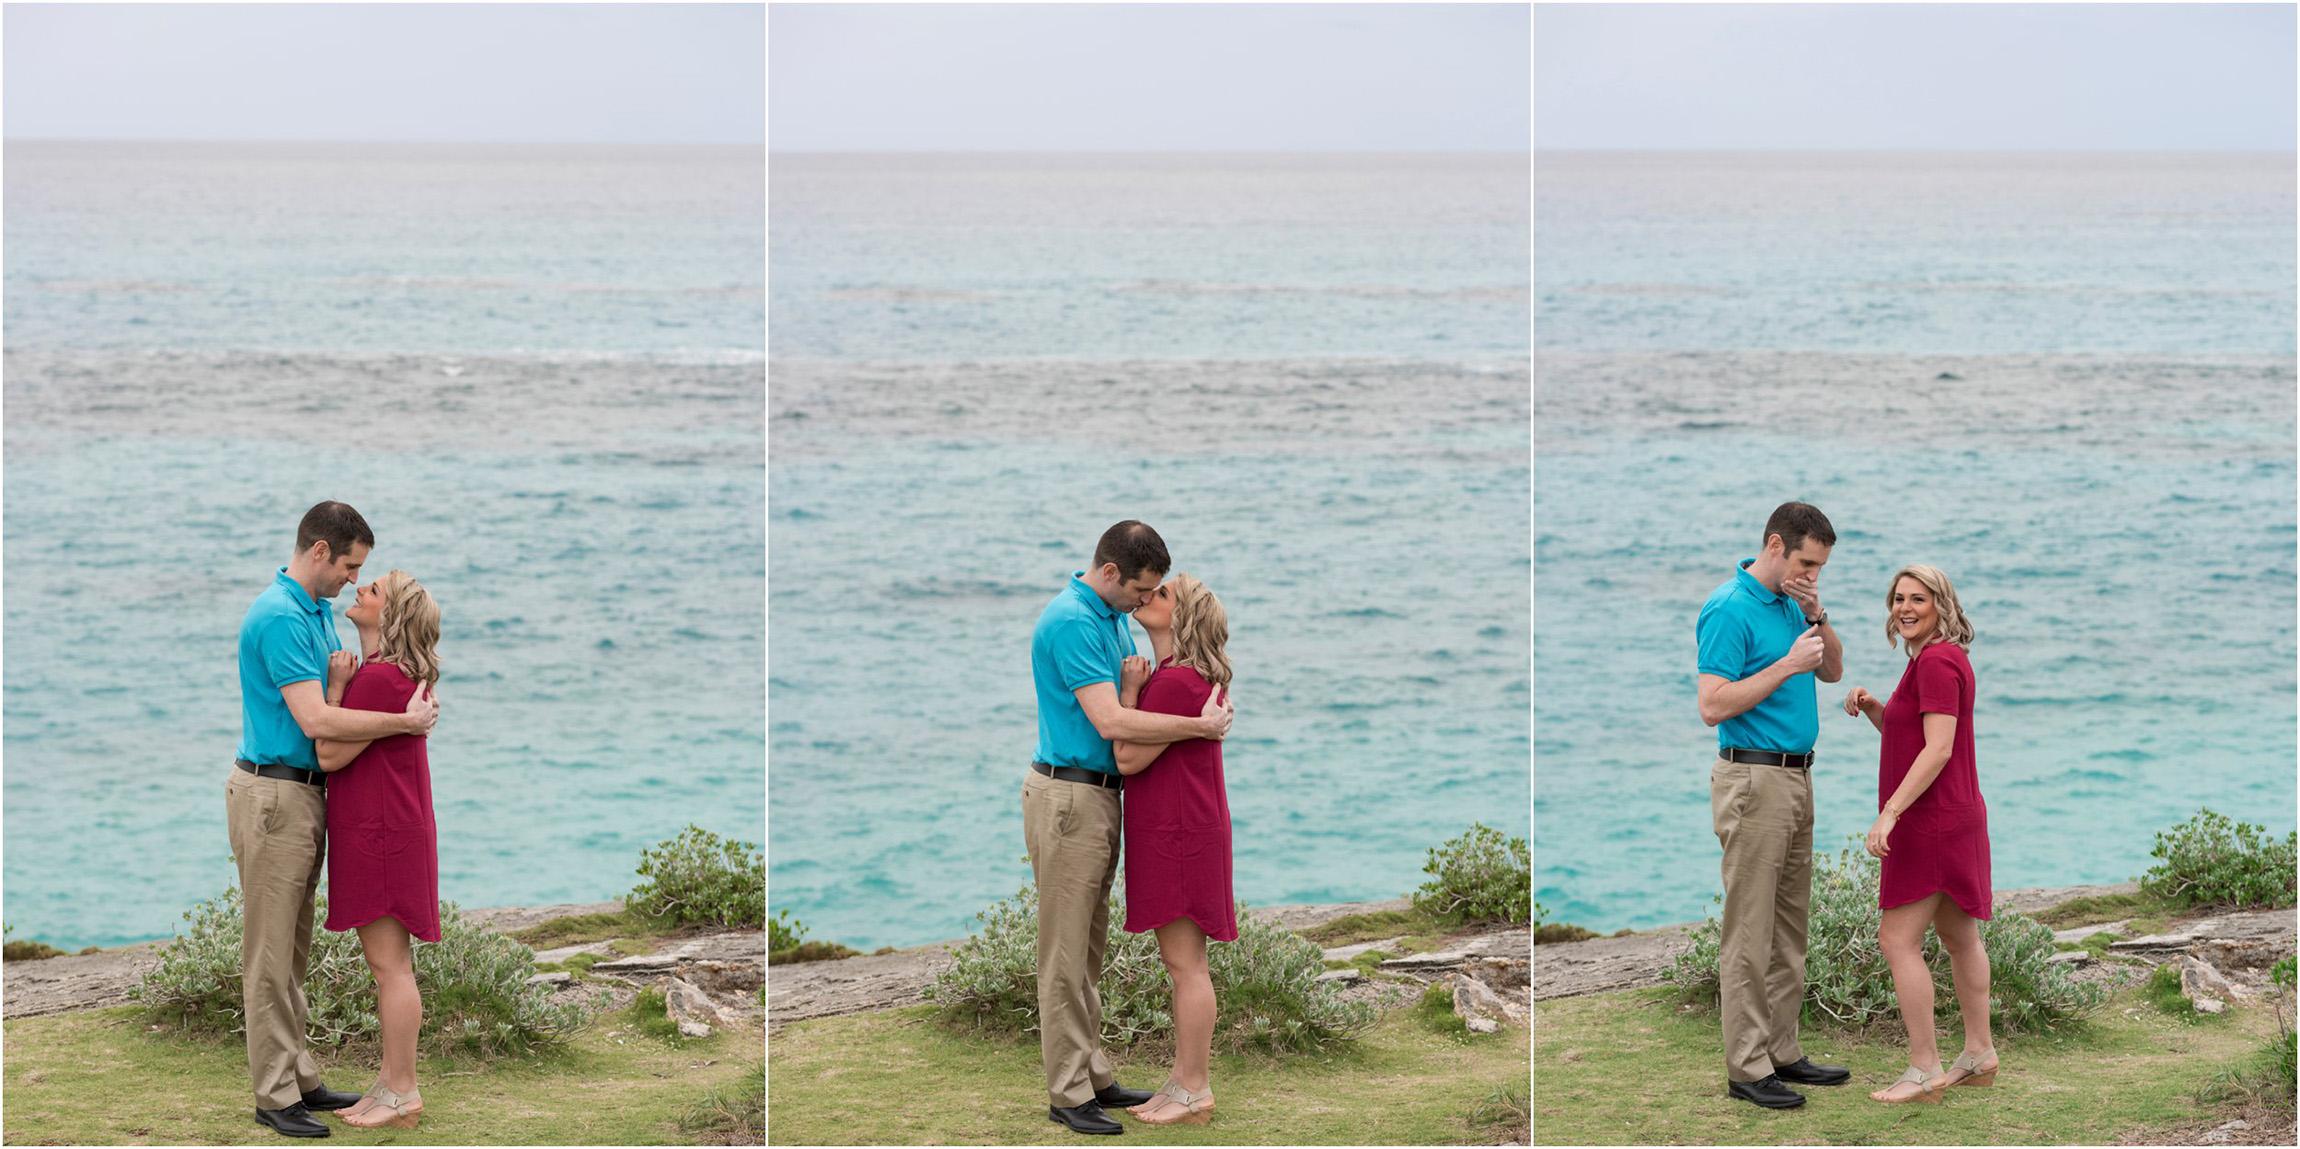 ©FianderFoto_Bermuda Photographer_Astwood Park_Vanessa_Kevin_001.jpg